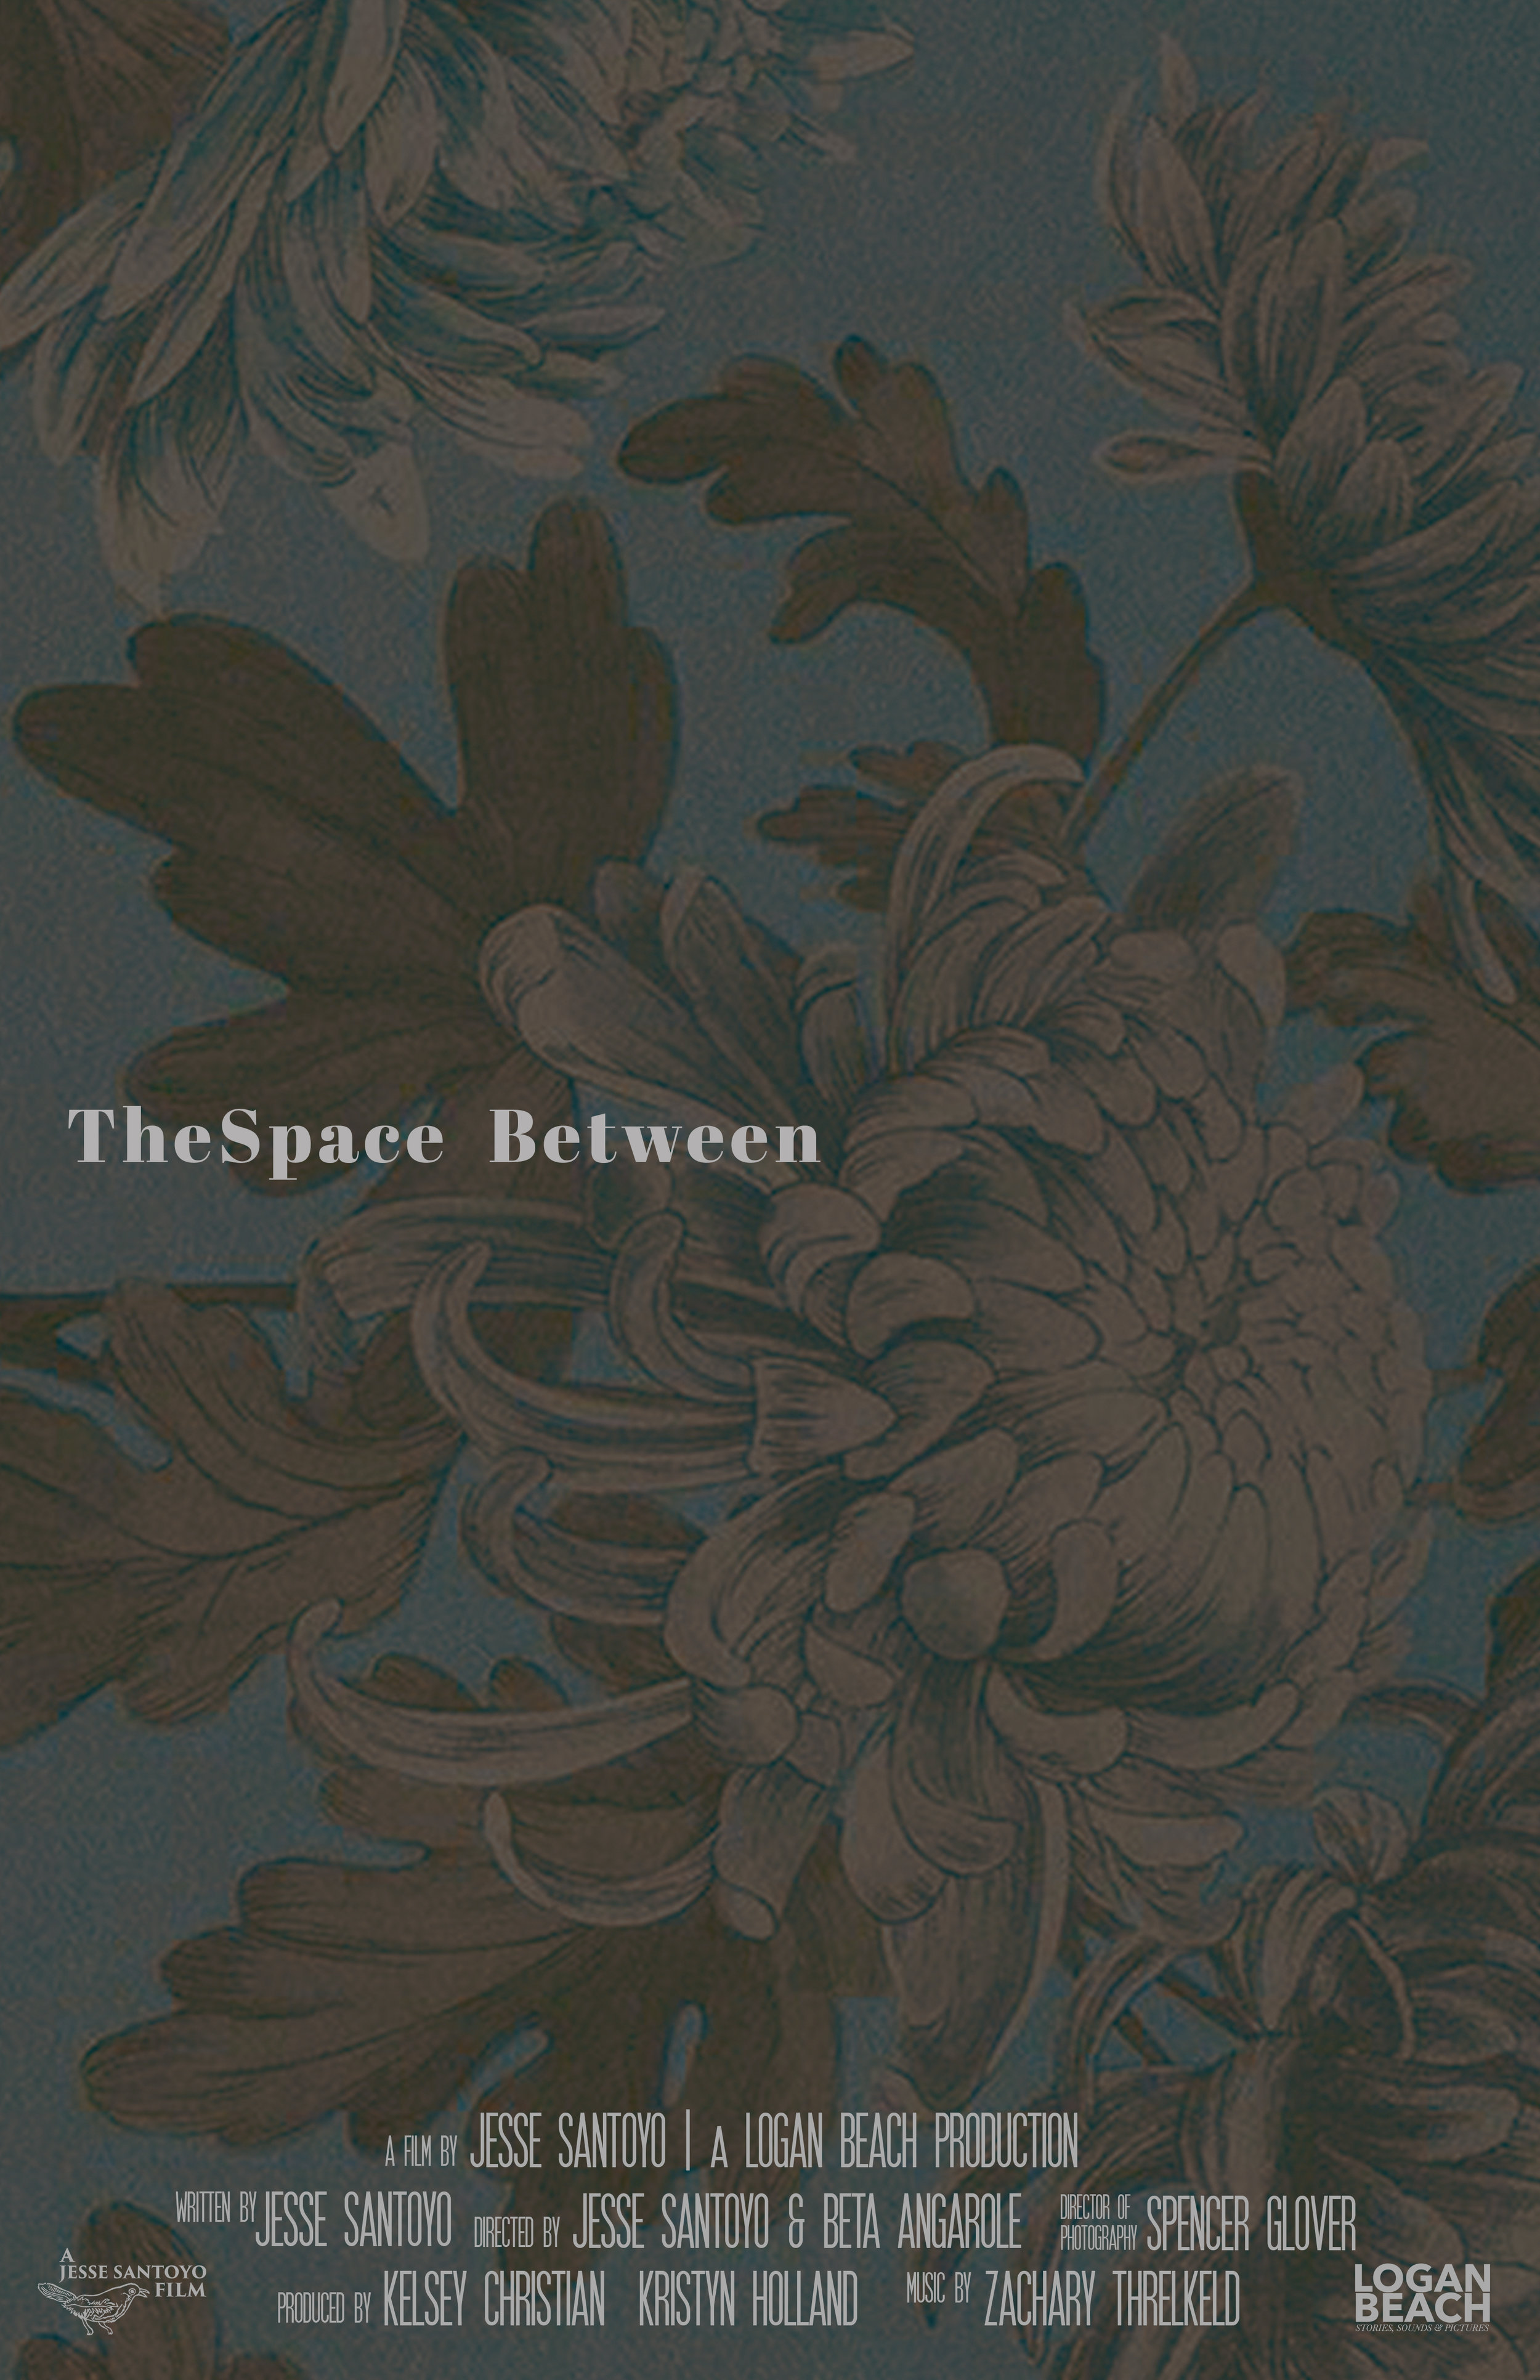 THESPACE BETWEEN POSTER (1).jpg